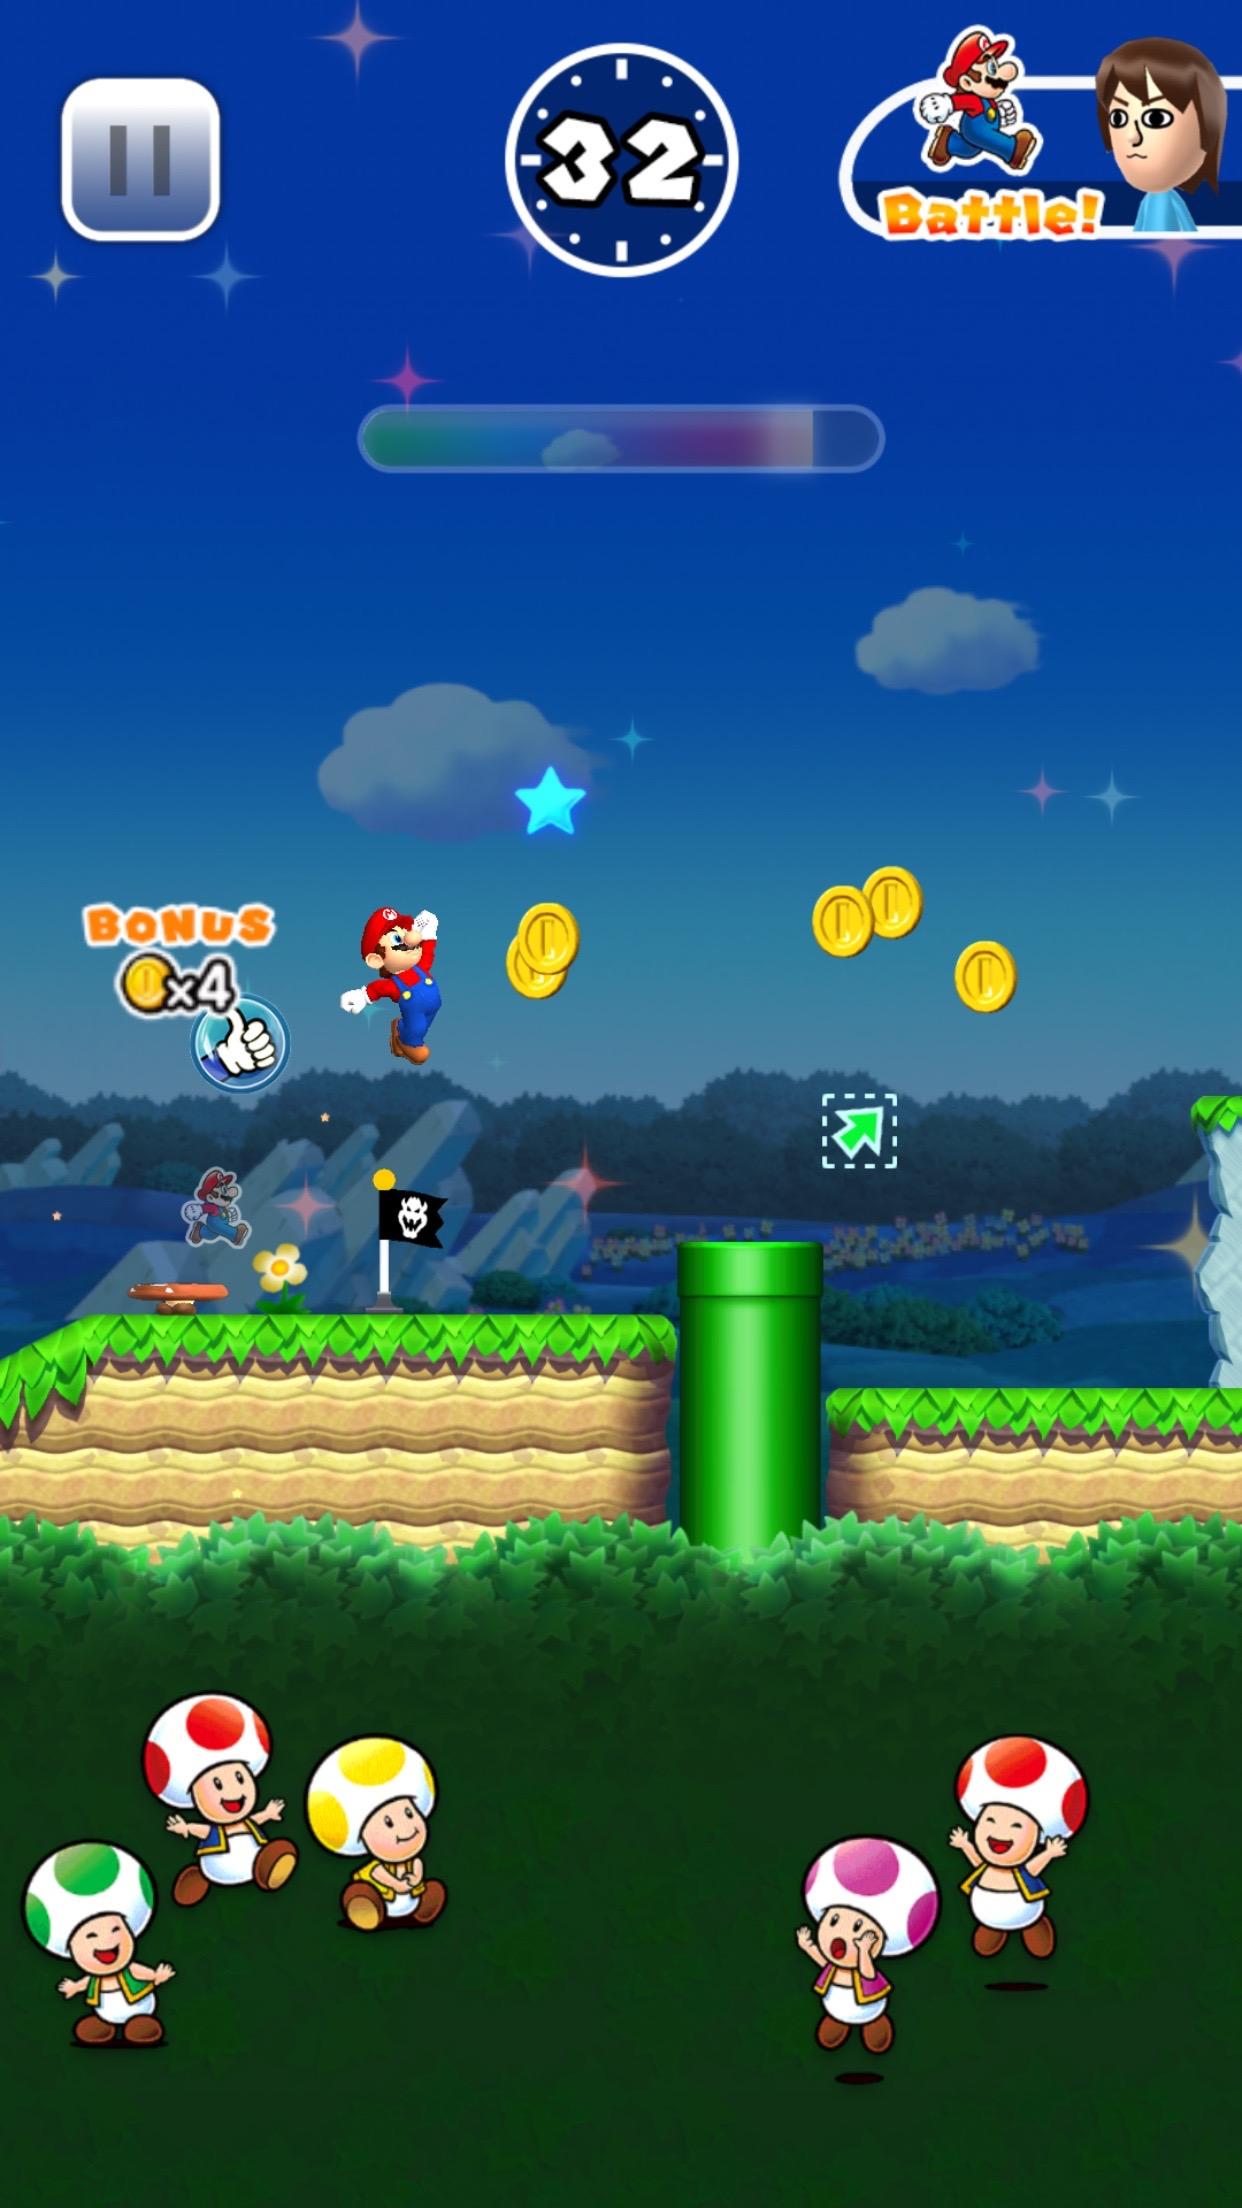 Super Mario Run rushes to iOS this holiday season - VG247